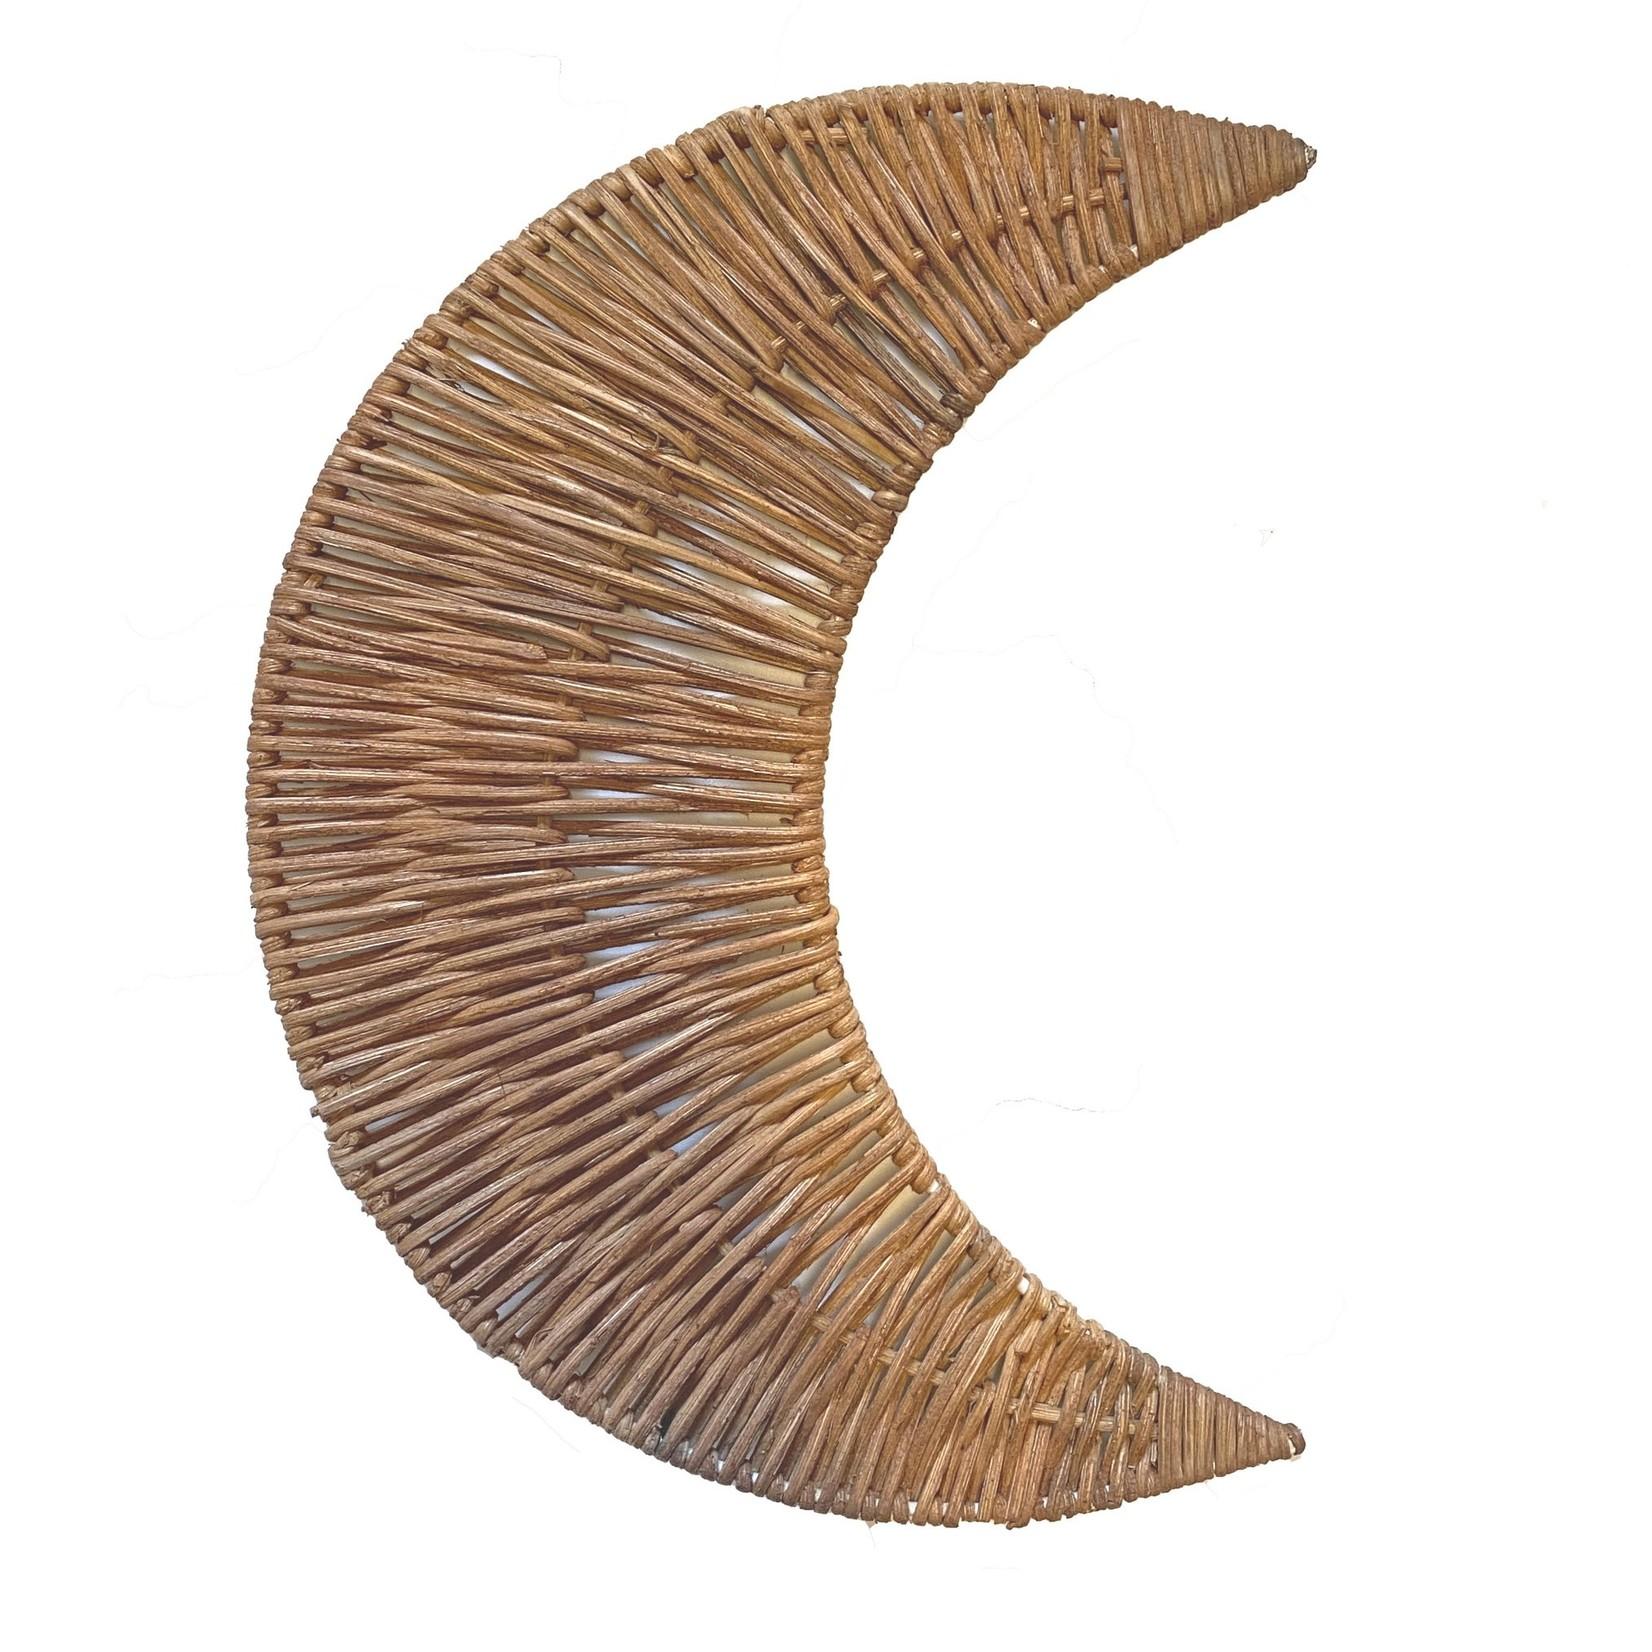 Kidooz B.V. Rotan maan hanger klein, 12 cm